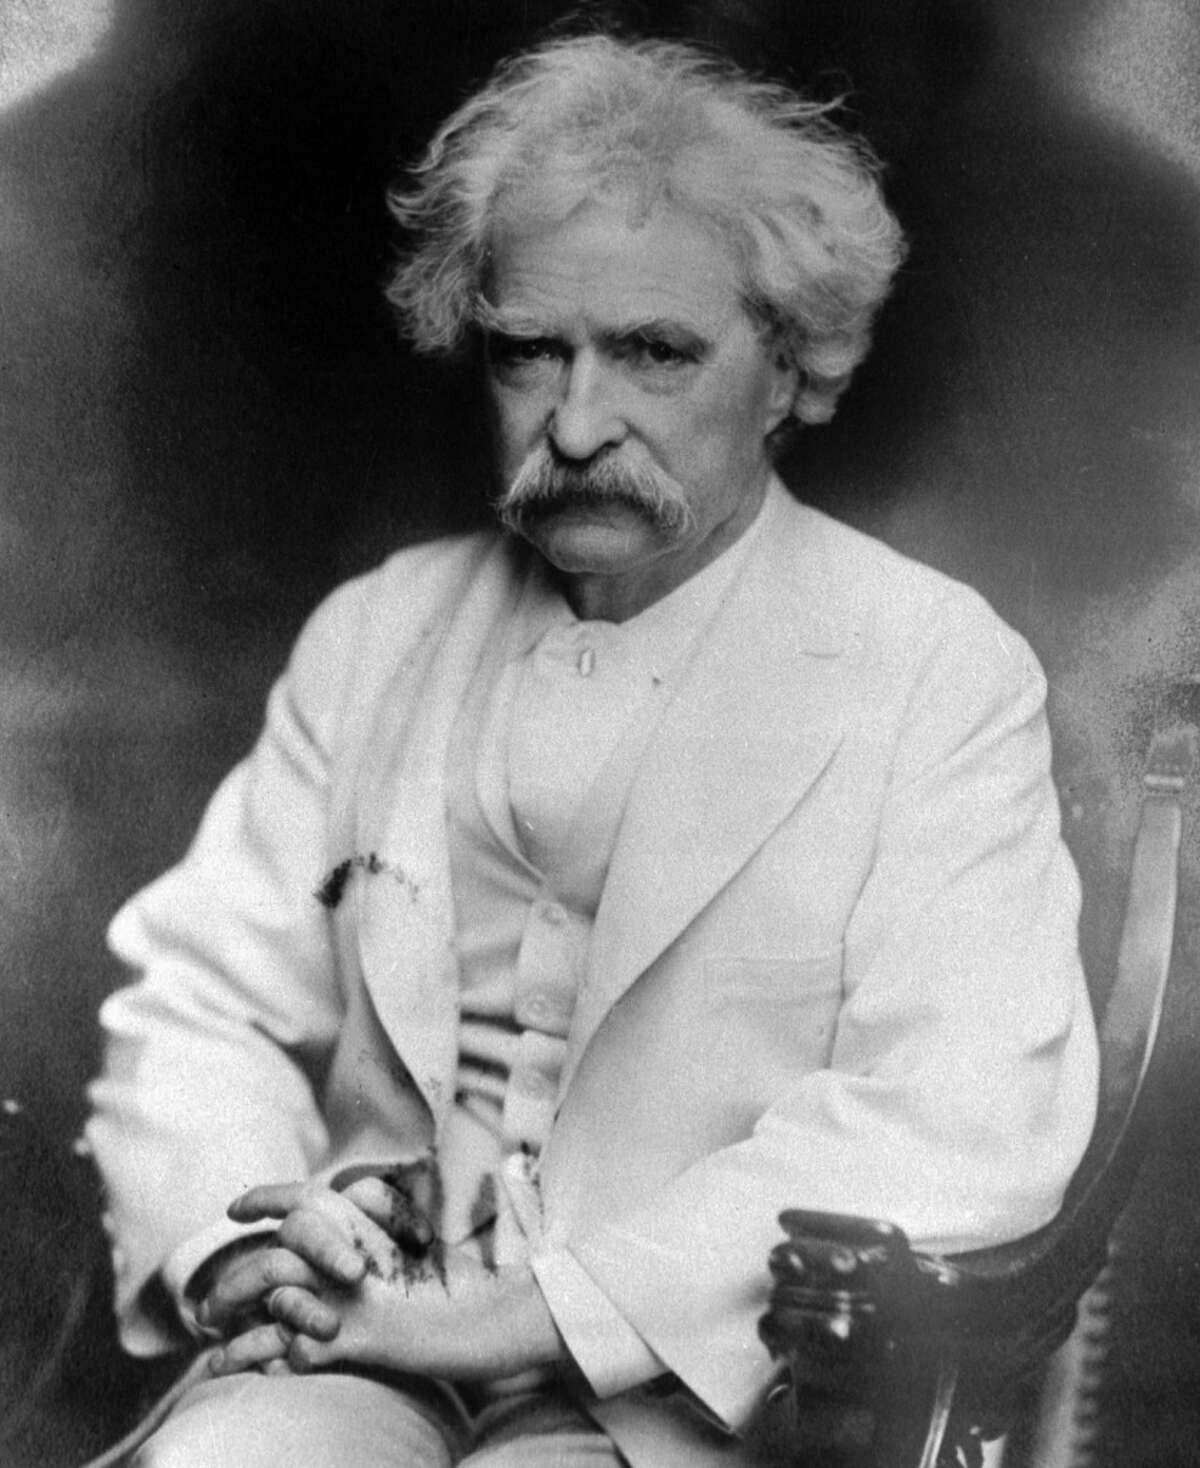 Samuel Clemens, AKA Mark Twain